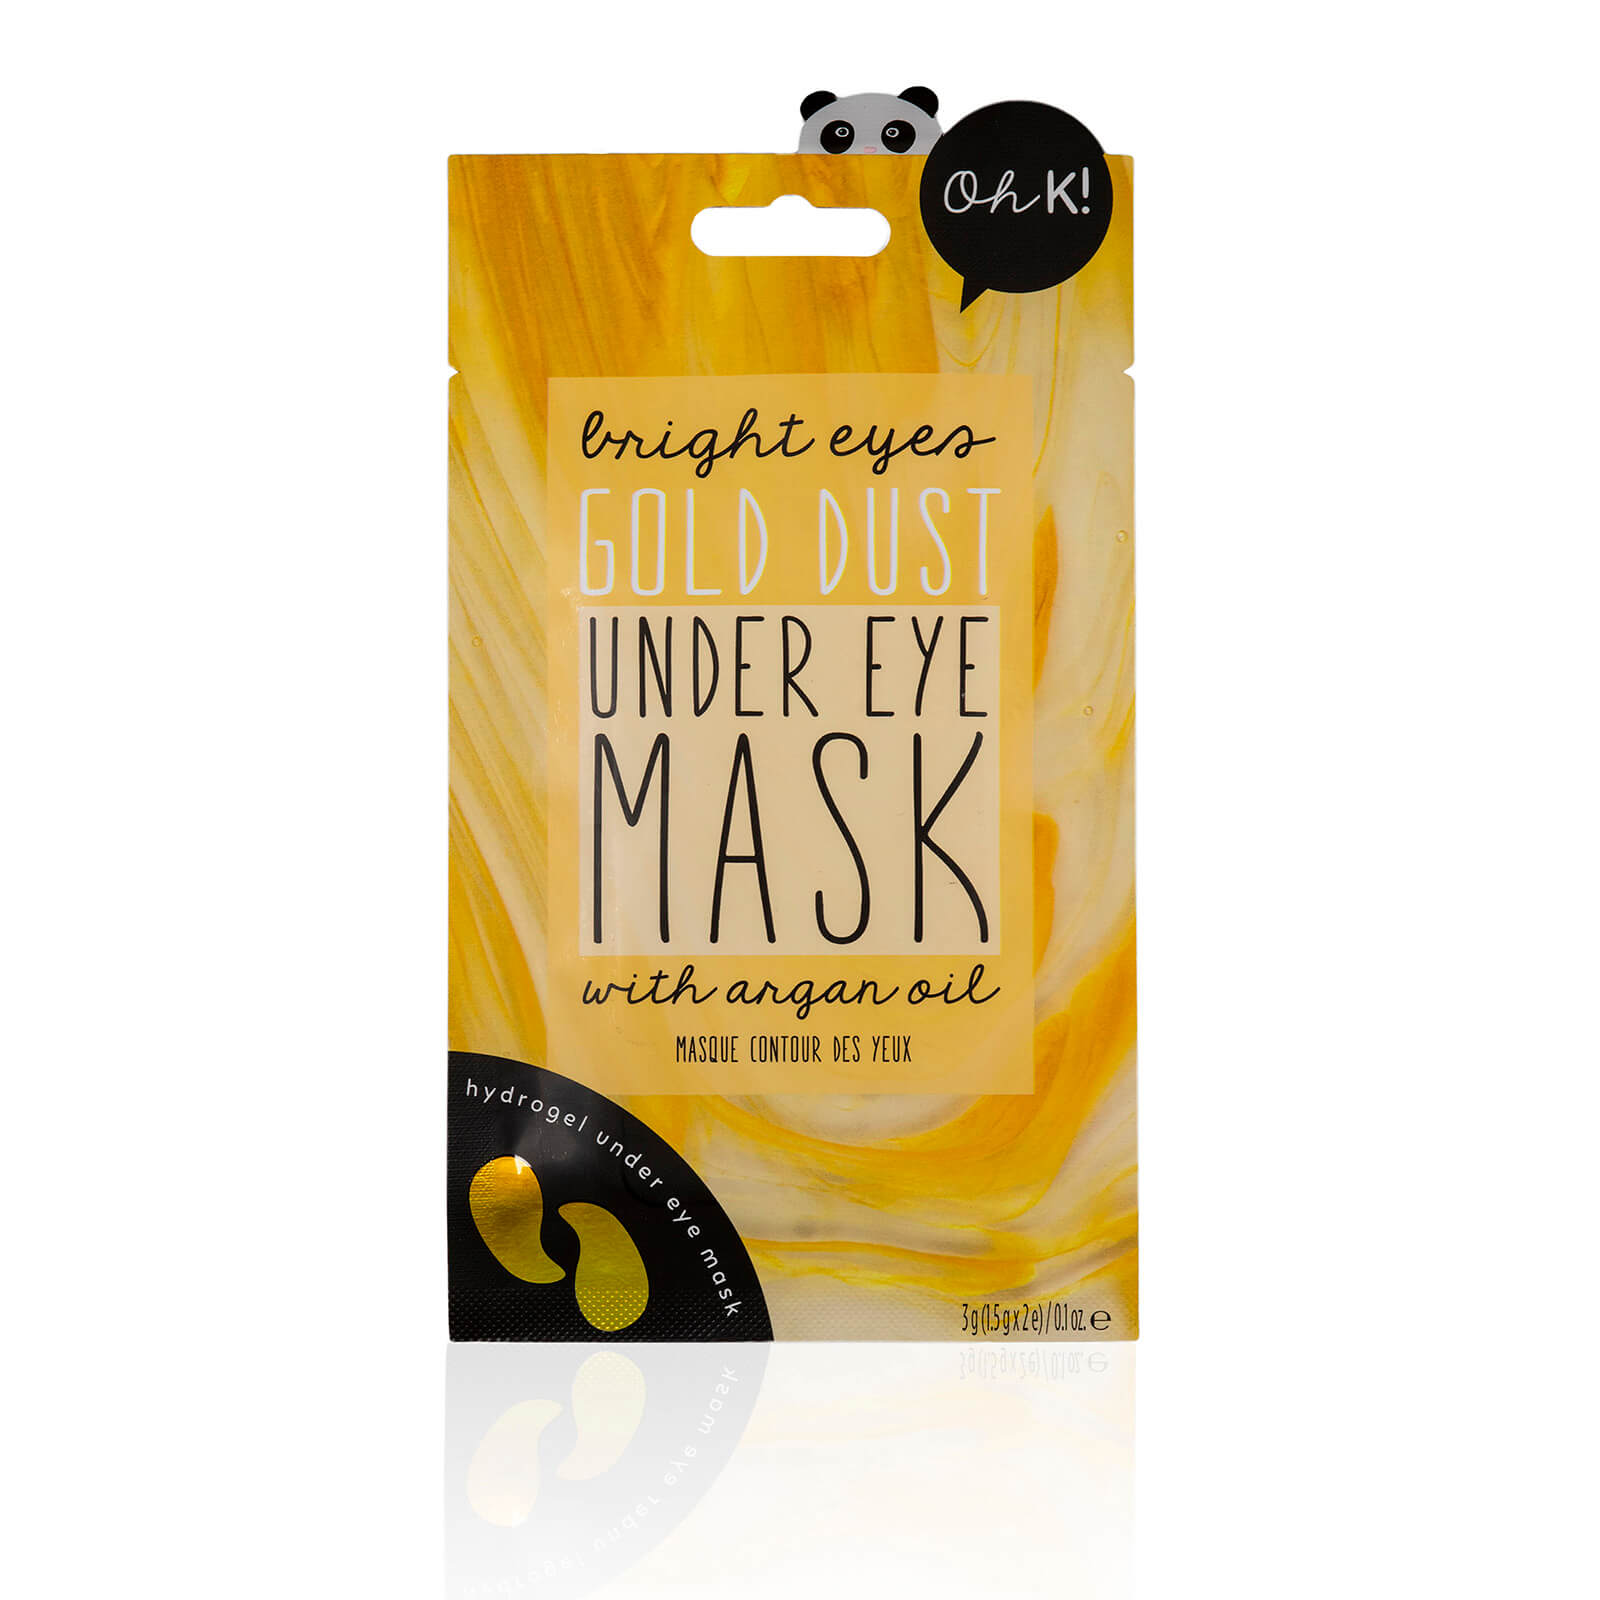 Купить Oh K! Gold Dust Under Eye Mask 3g